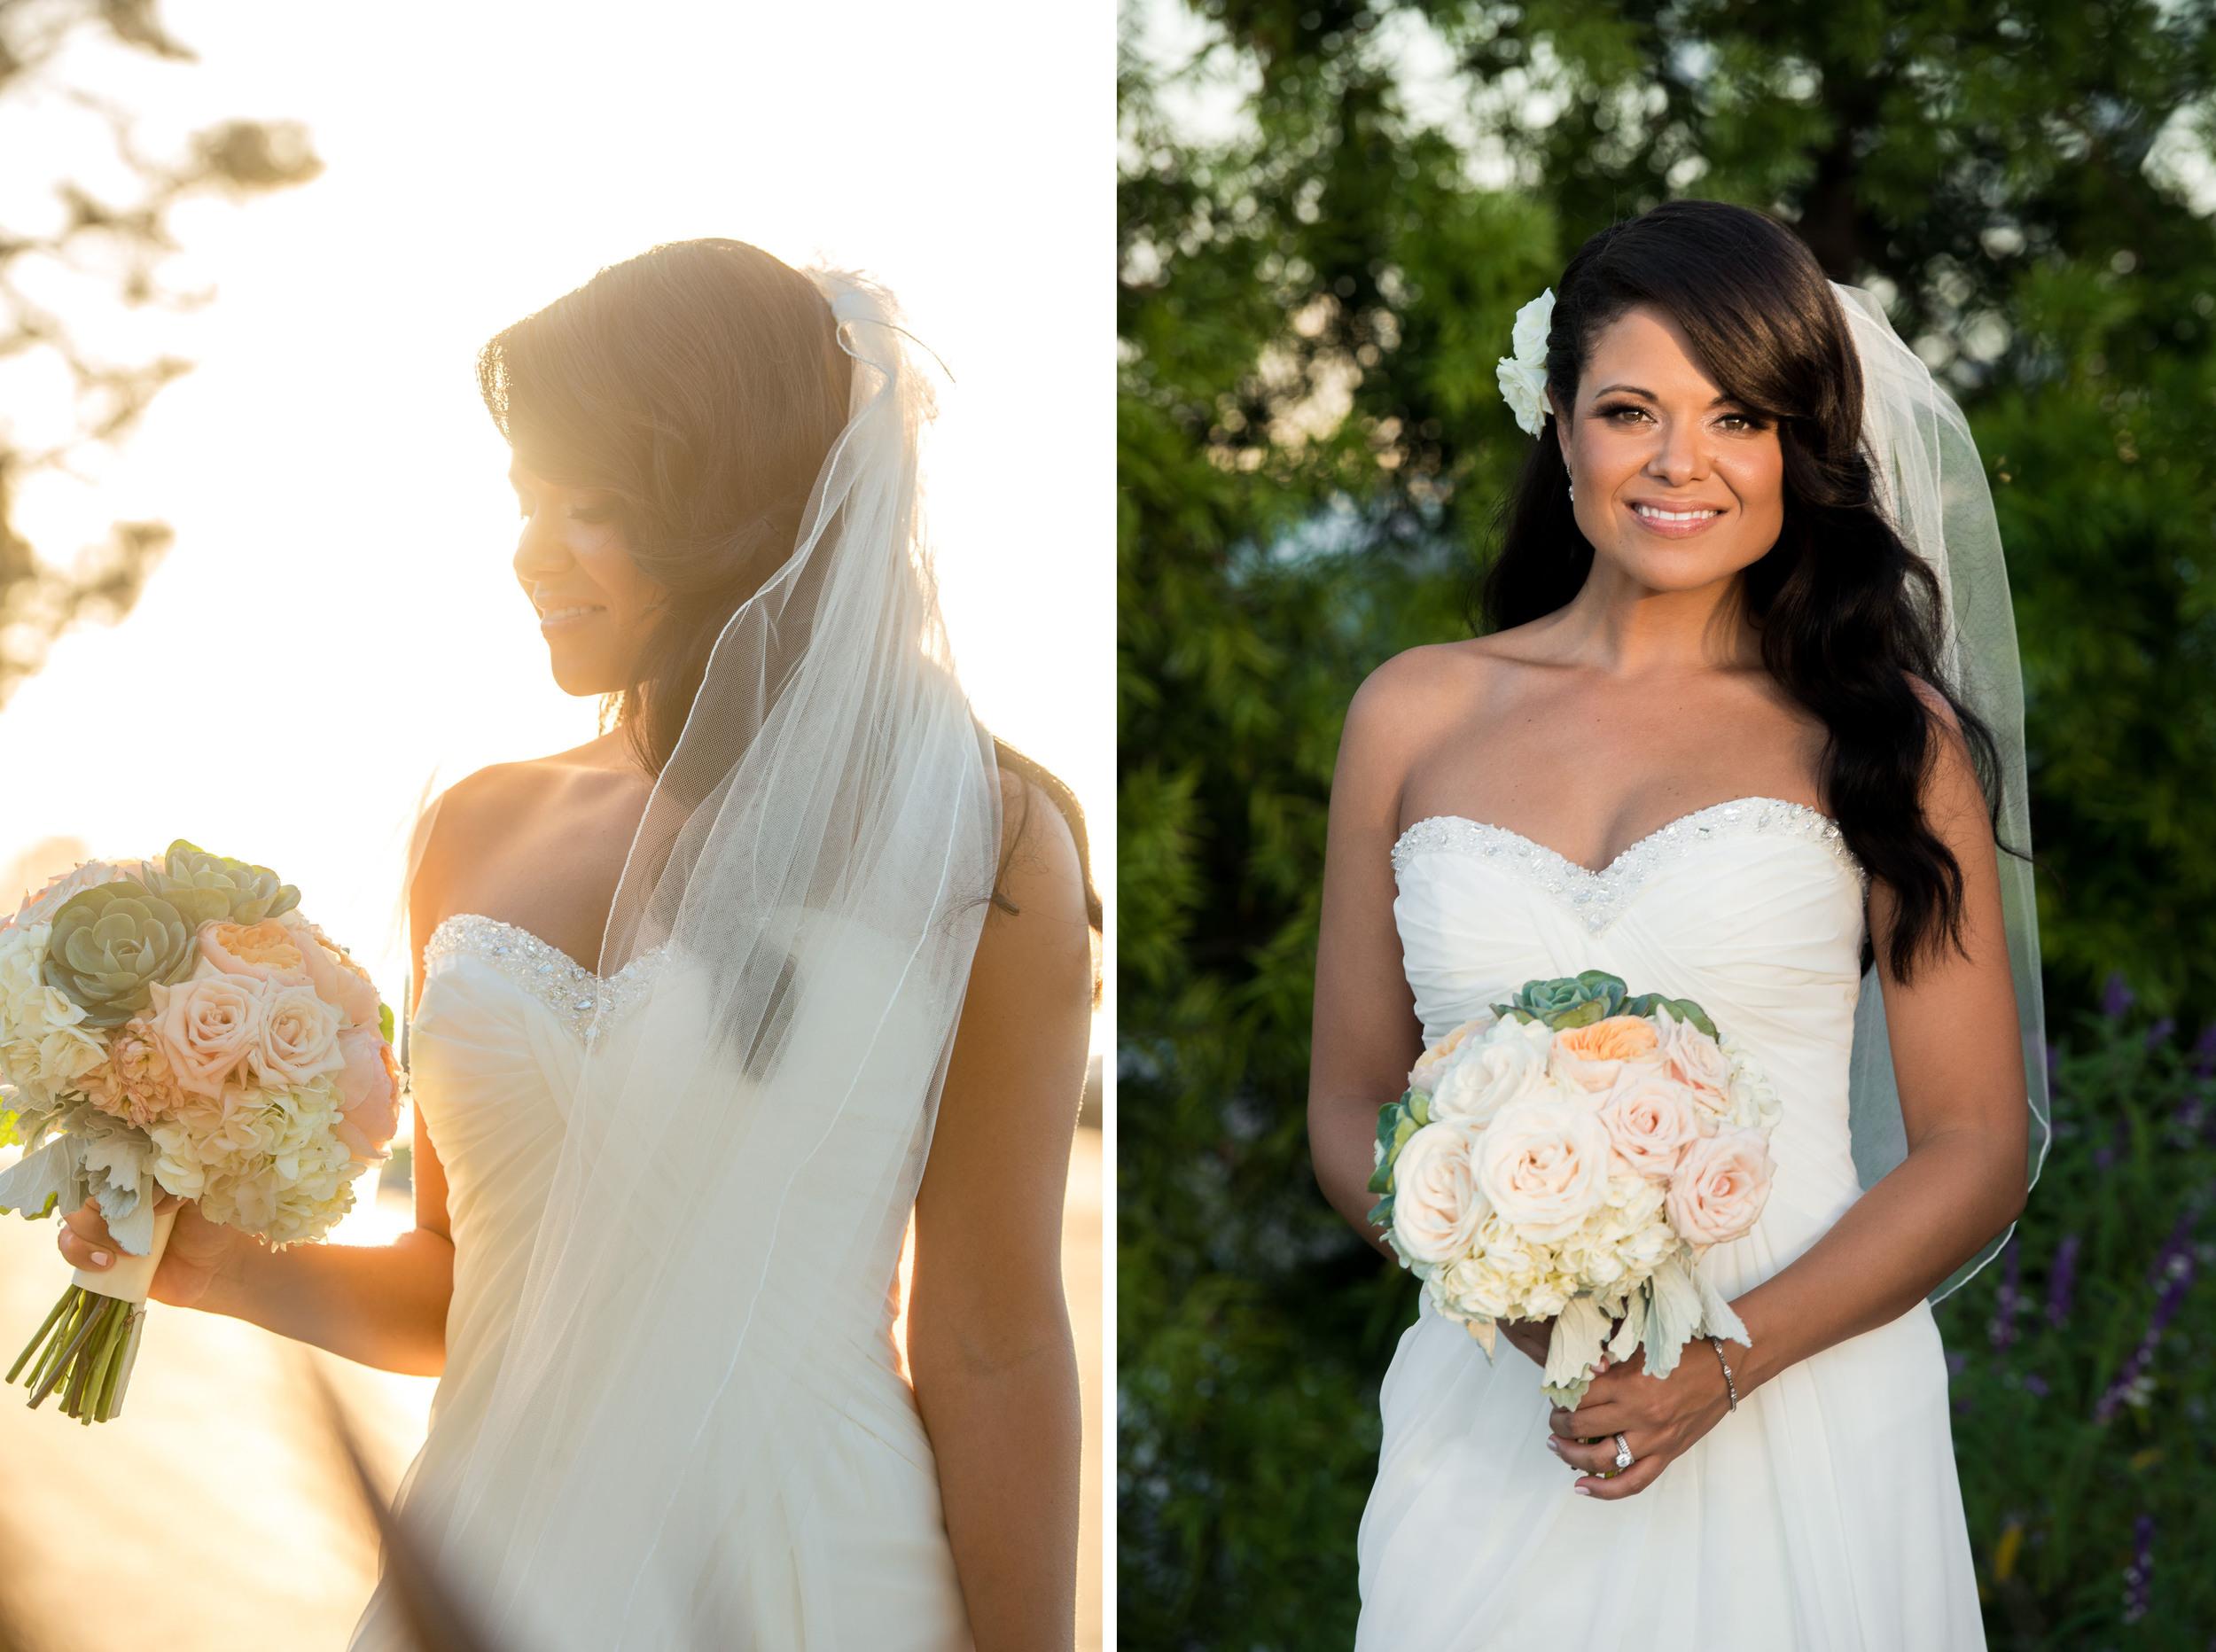 tom-hams-lighthouse-wedding-_D803133.jpg